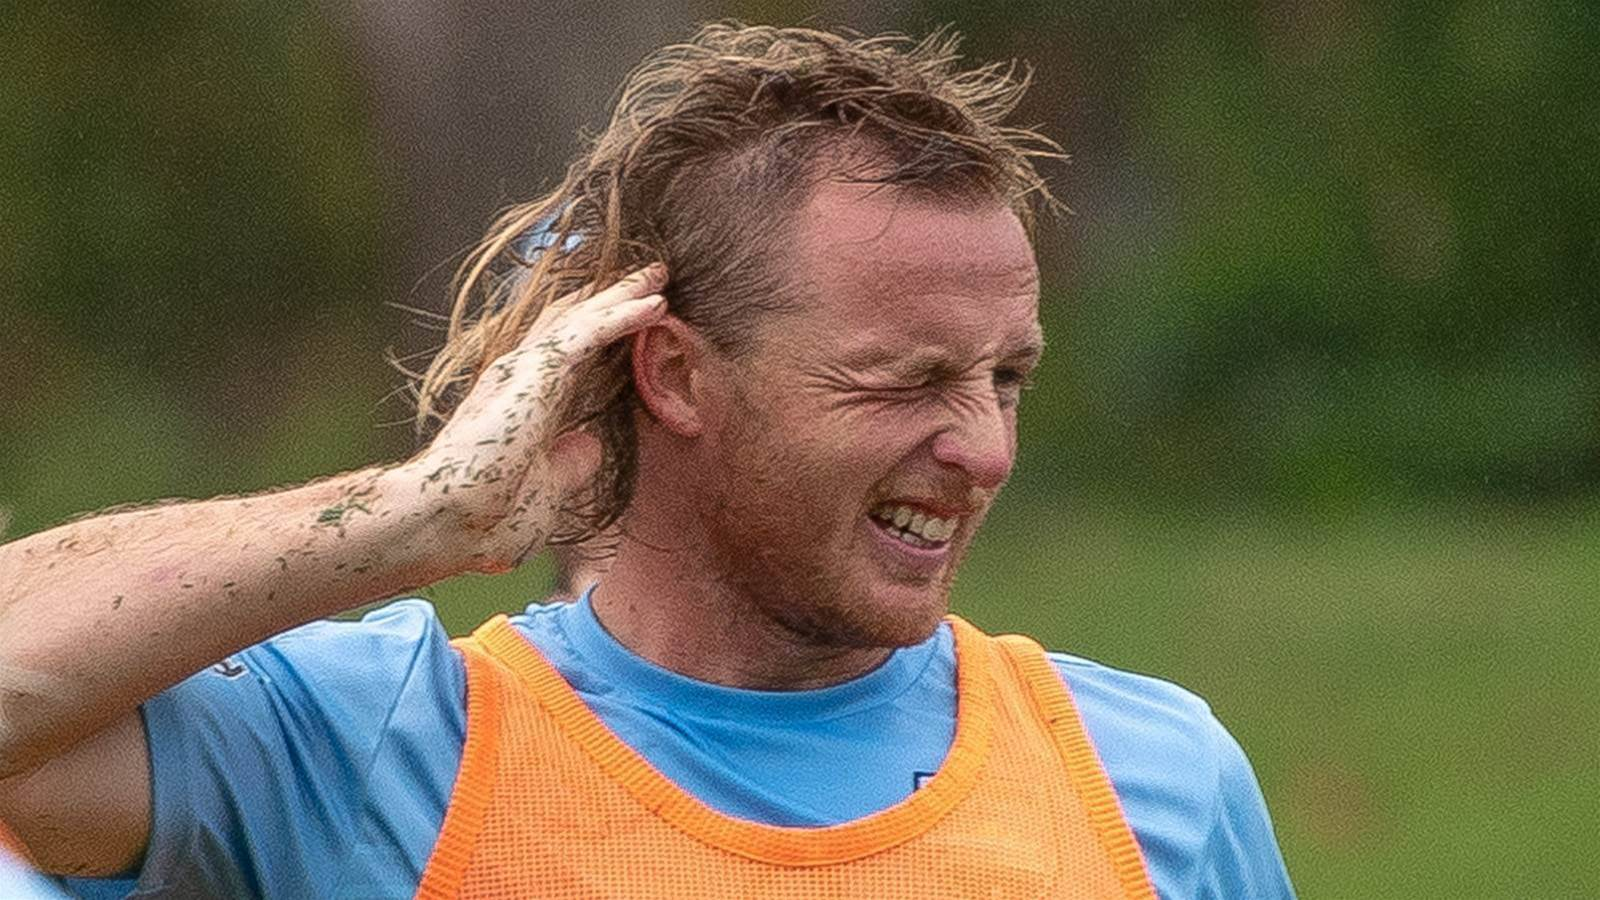 Socceroo's Near Death Surfing Experience